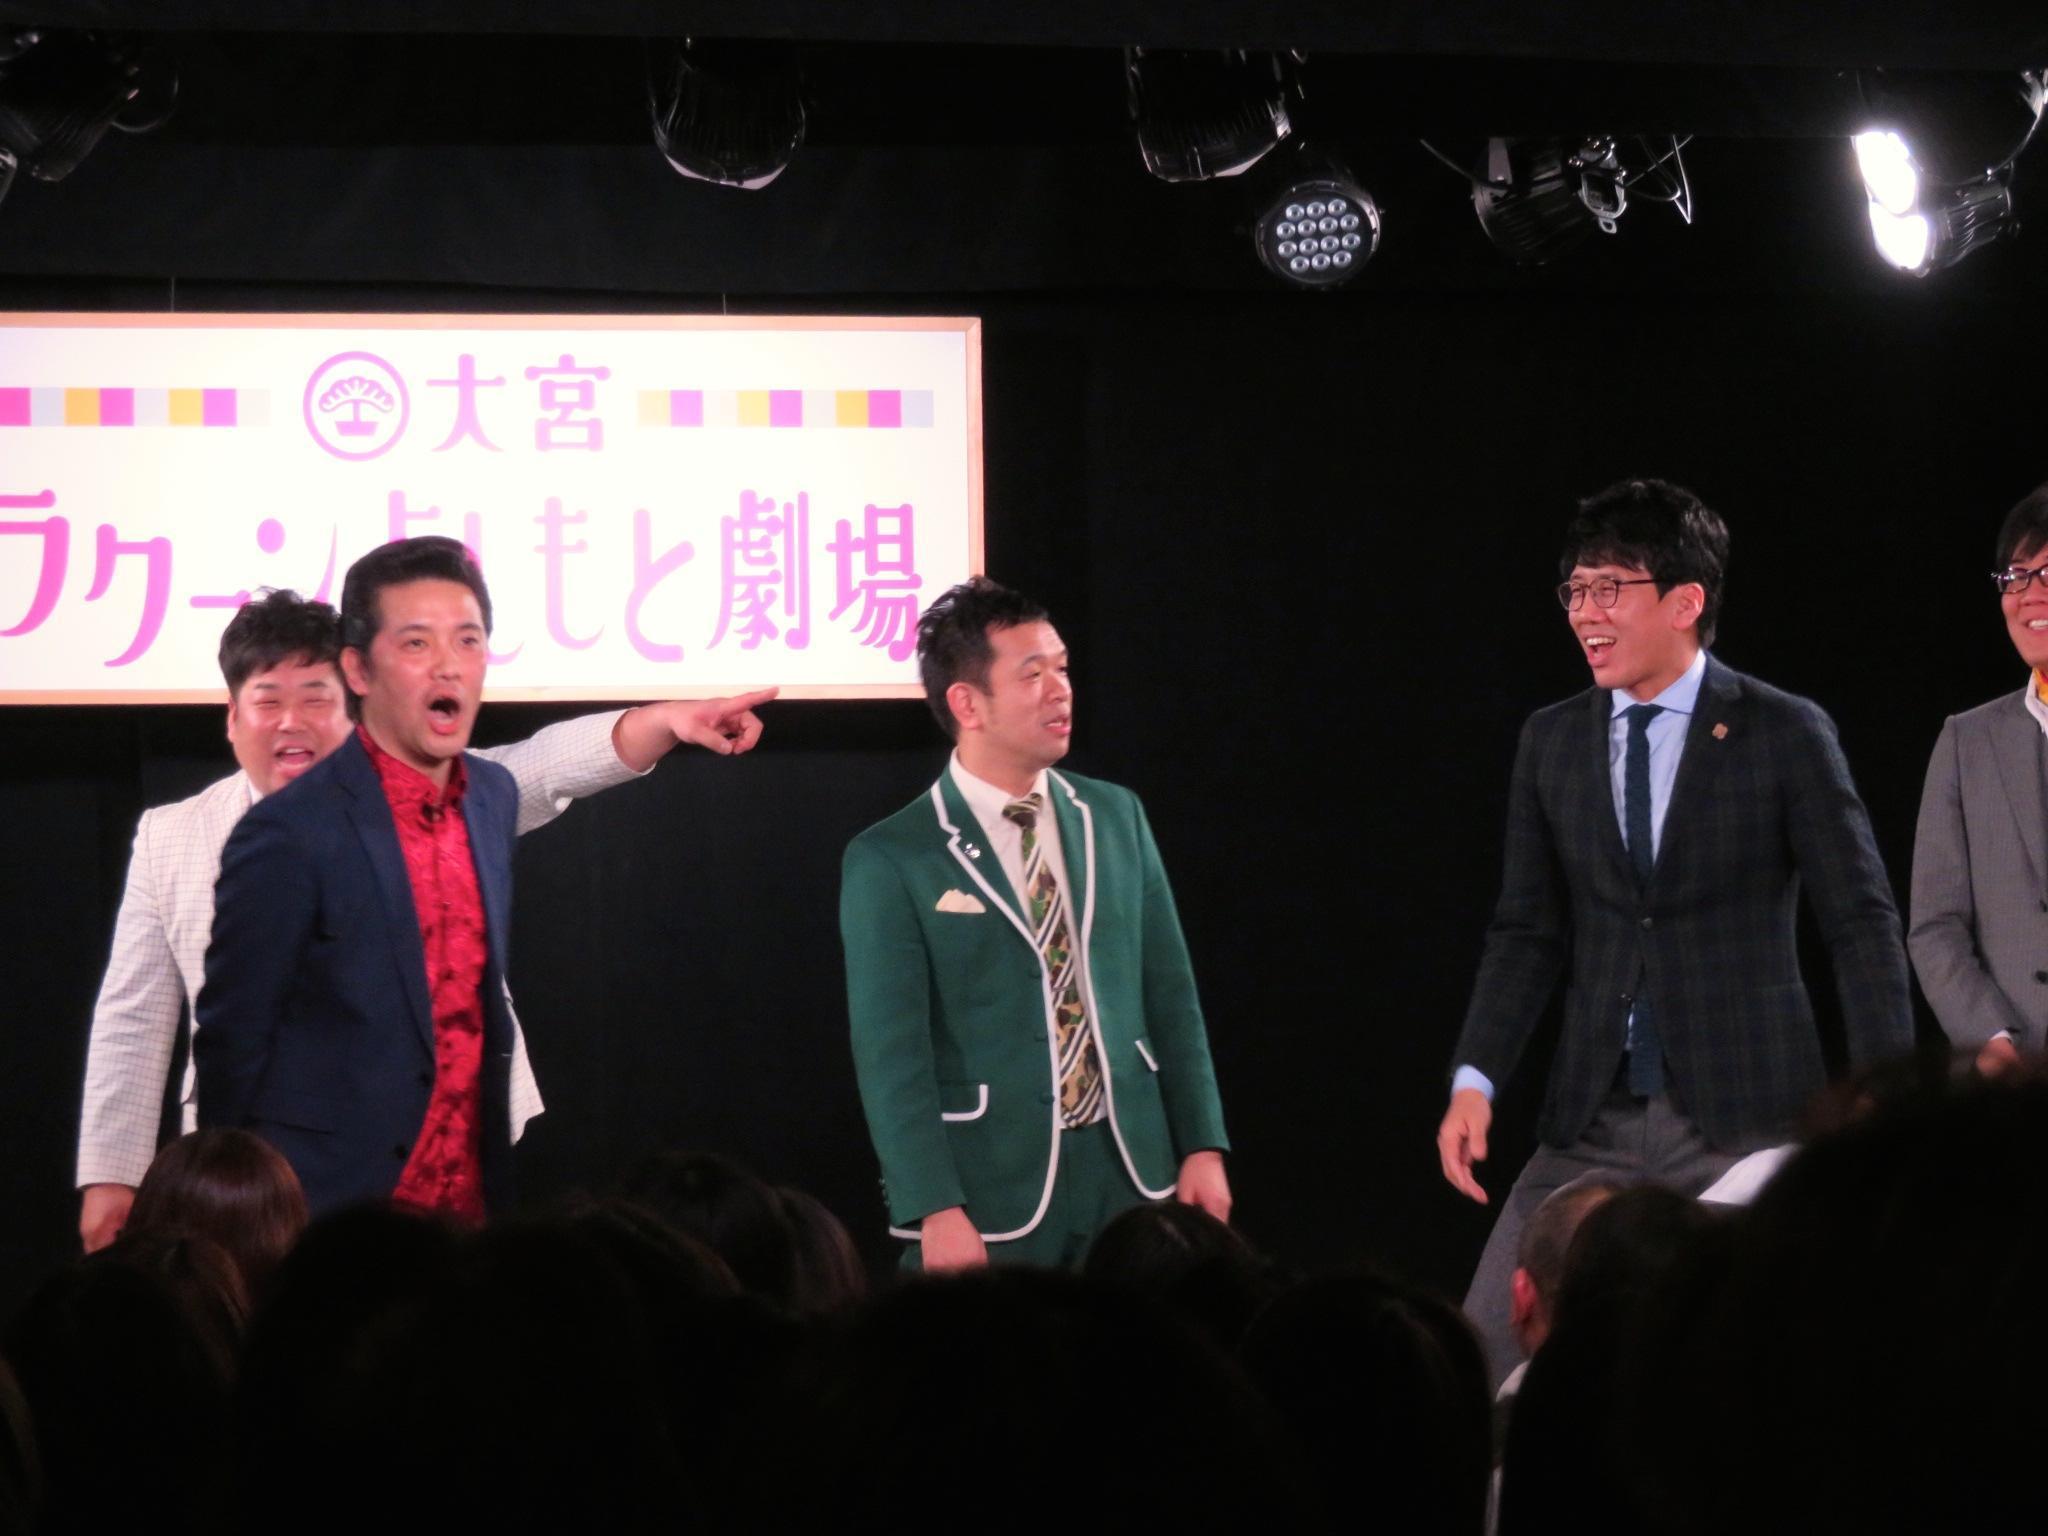 http://news.yoshimoto.co.jp/20171230223039-b206a153c3591c6696f540abec909f43106c9634.jpg